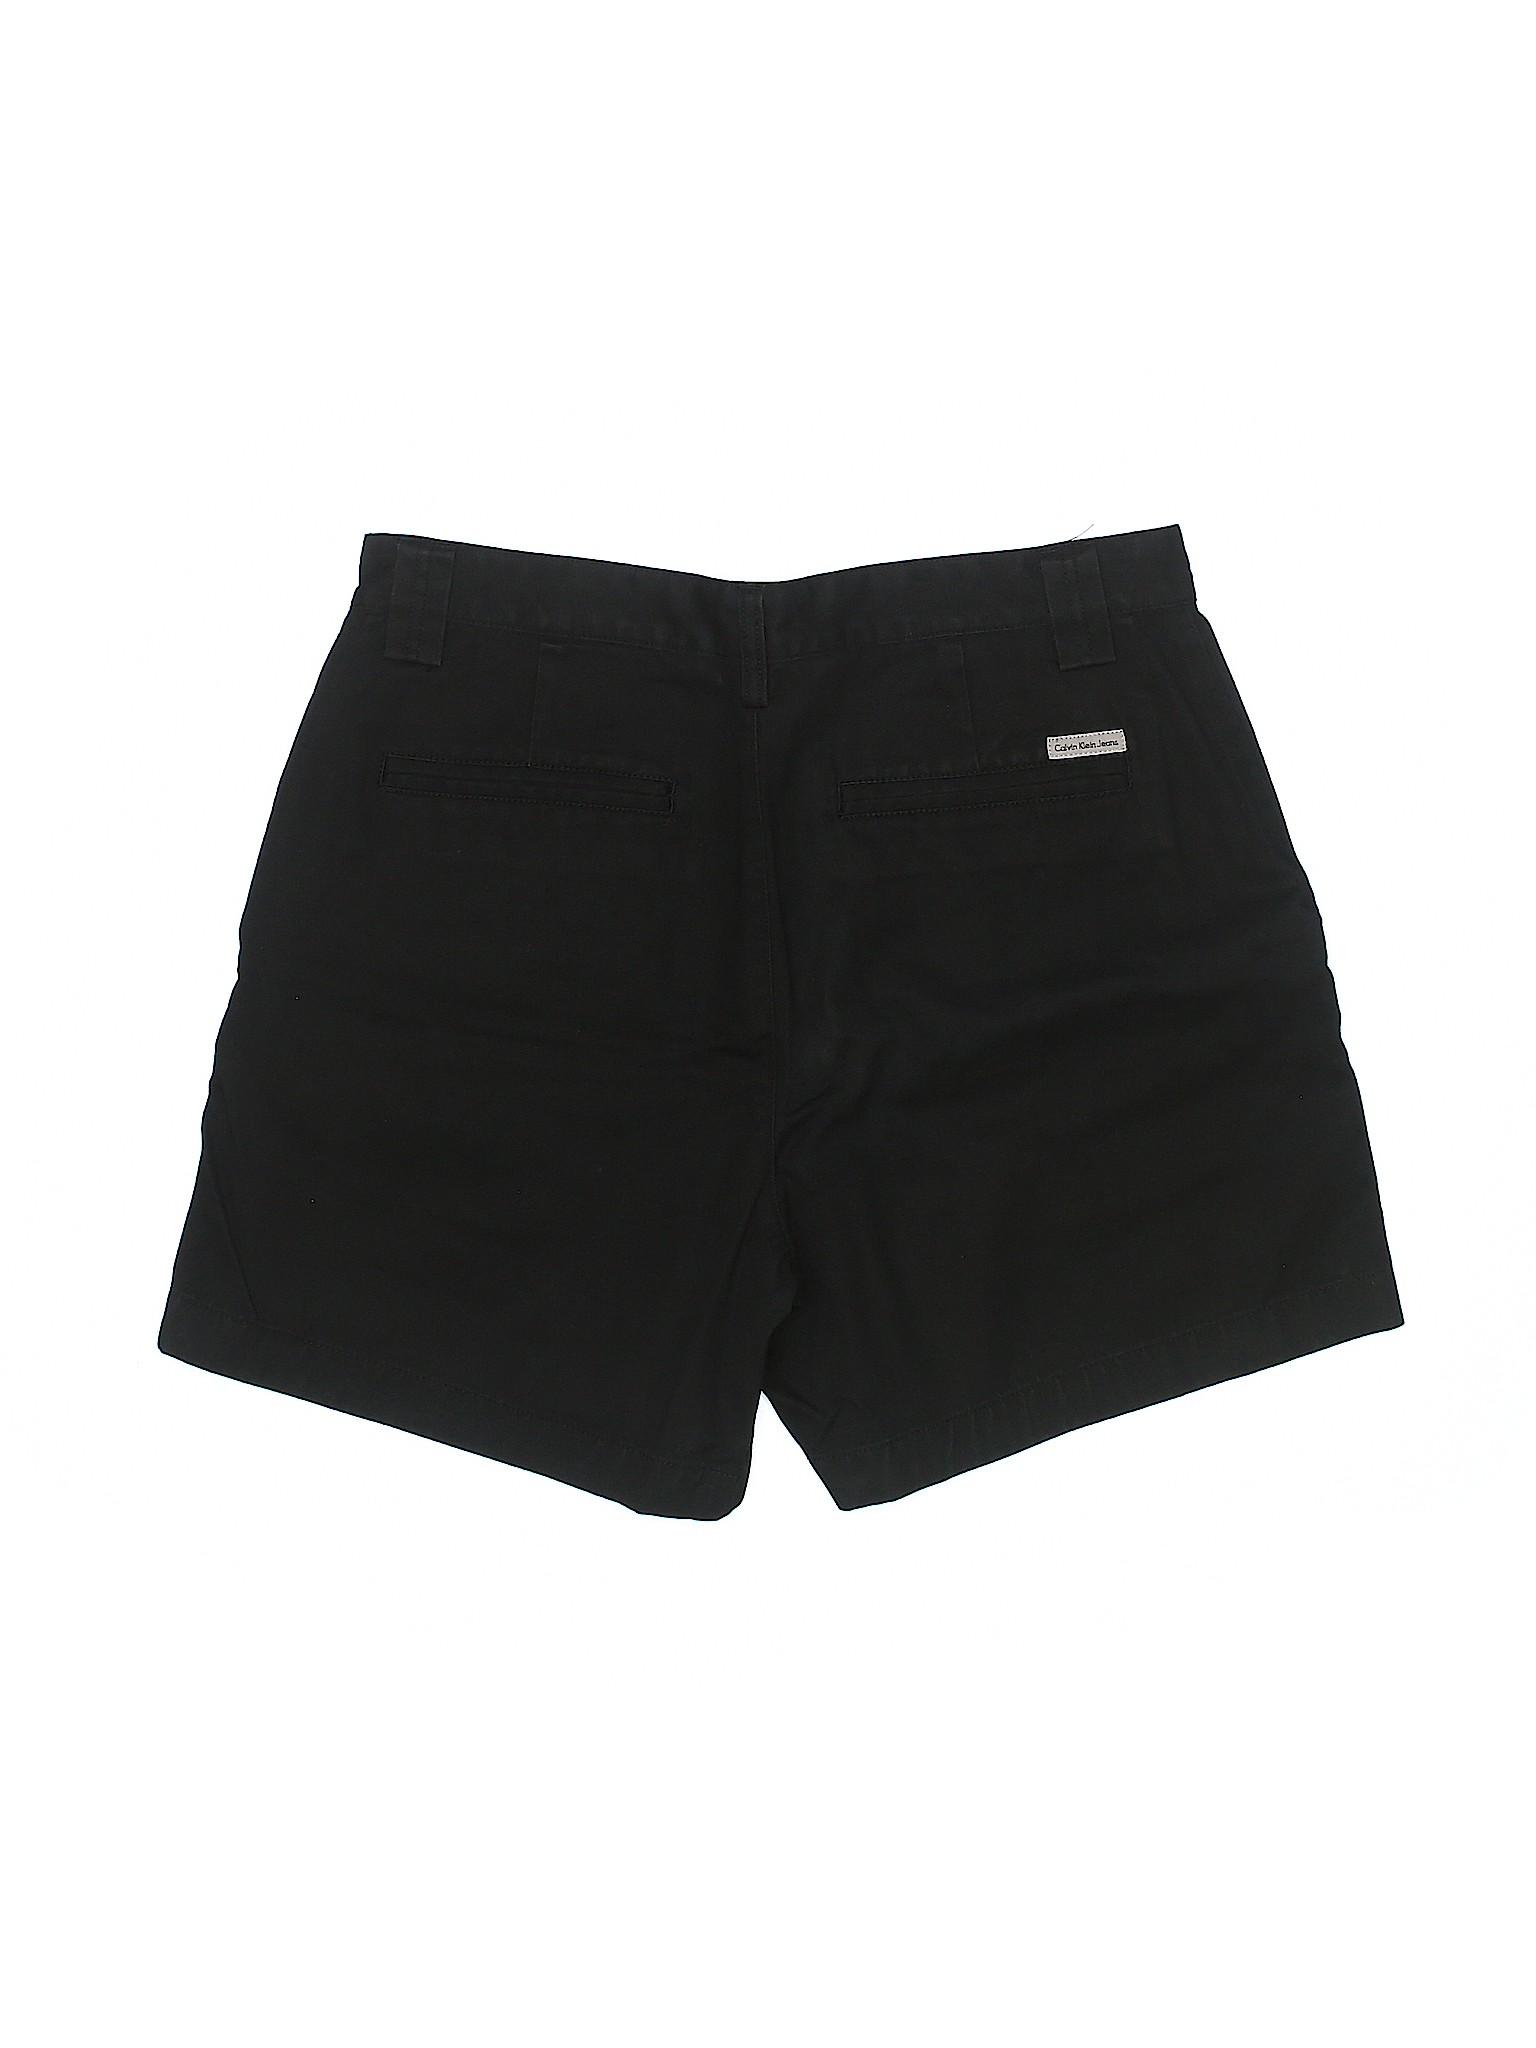 Shorts Klein Boutique Boutique Boutique Calvin Klein Shorts Calvin B0Y5S